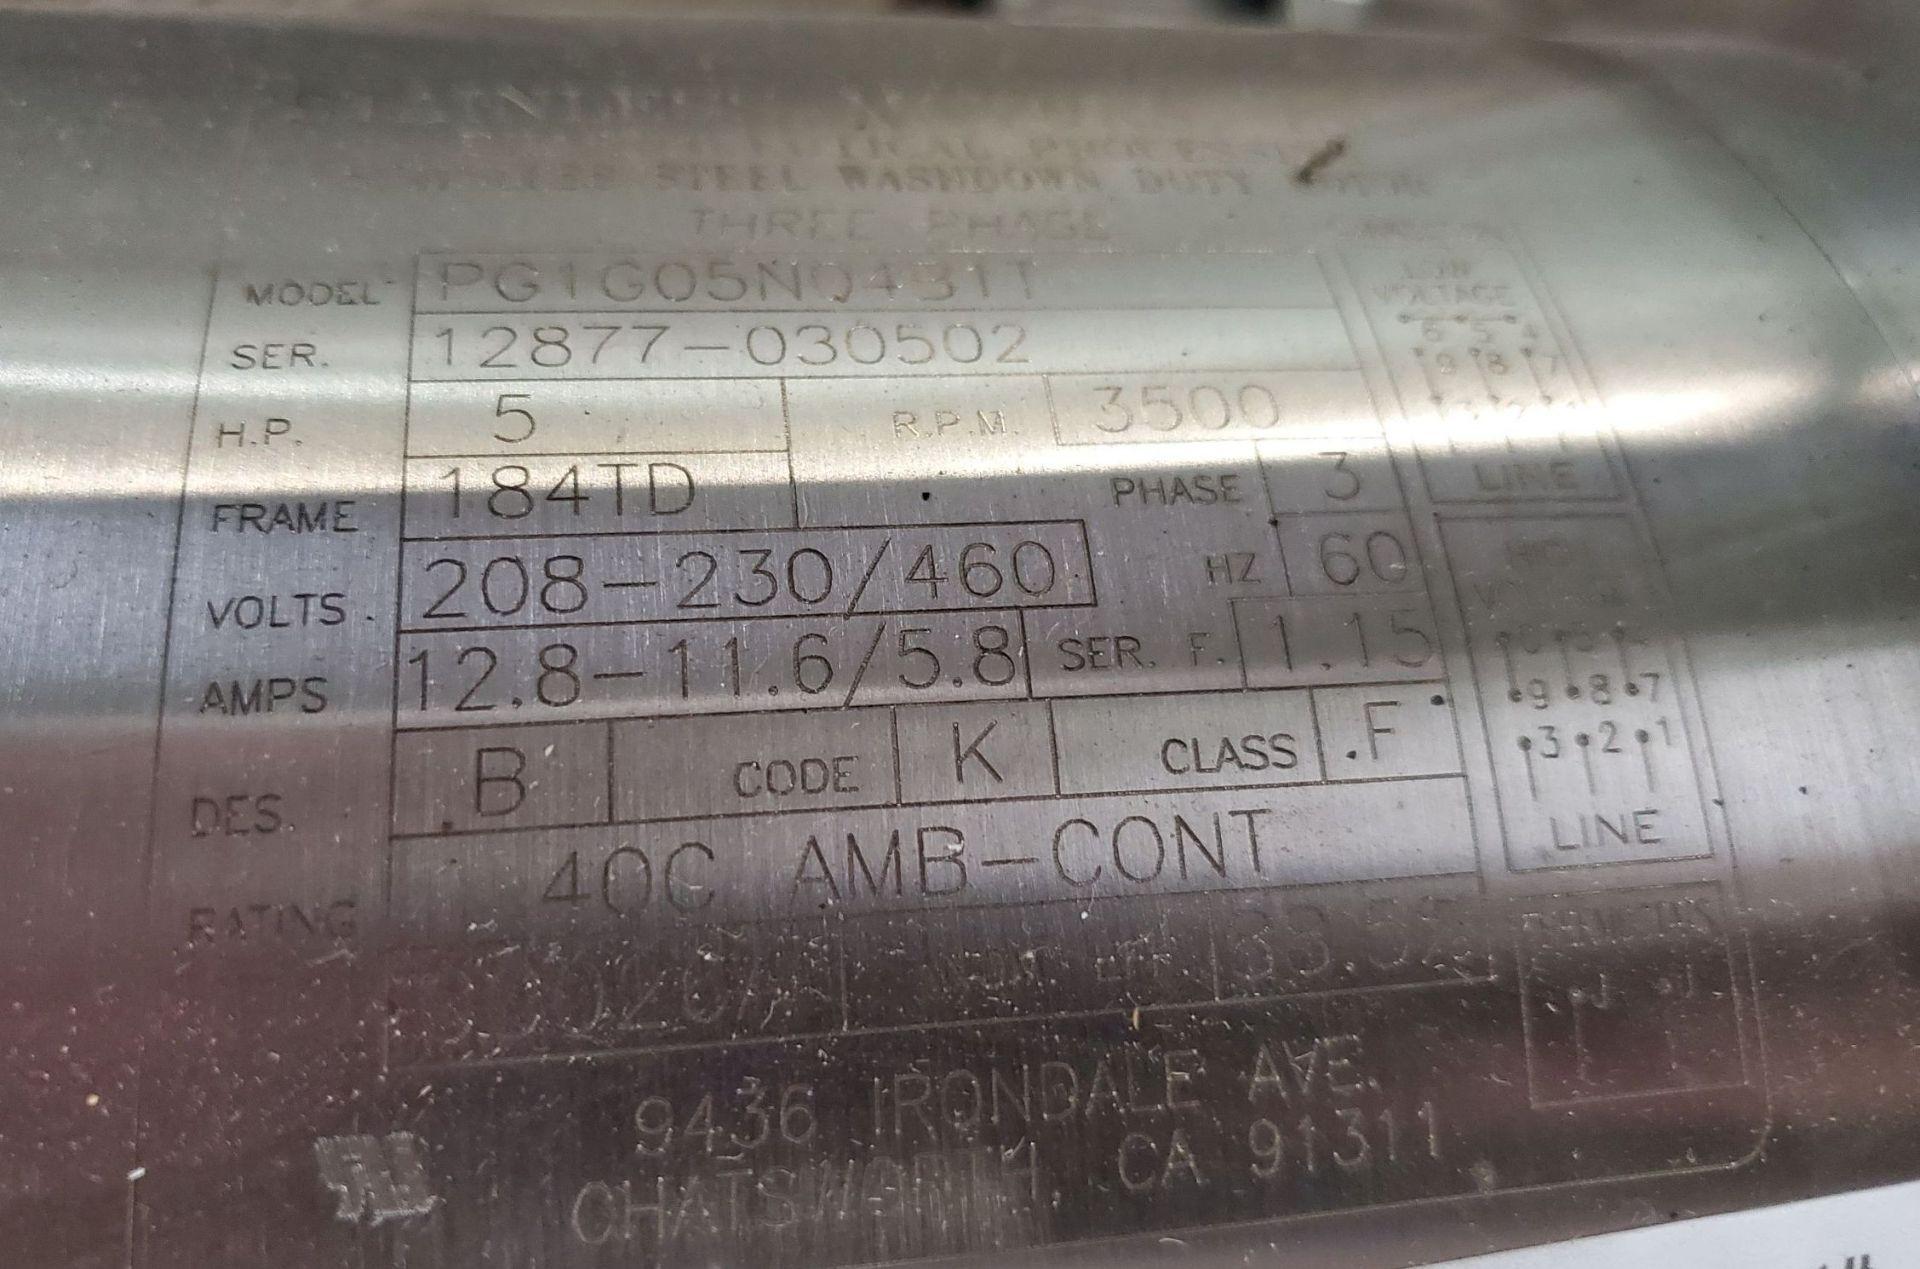 Lot 8 - 5 hp Ross Emulsifier, model HSM 105 SLIM, 3500 RPM, 208-230/460 volts,